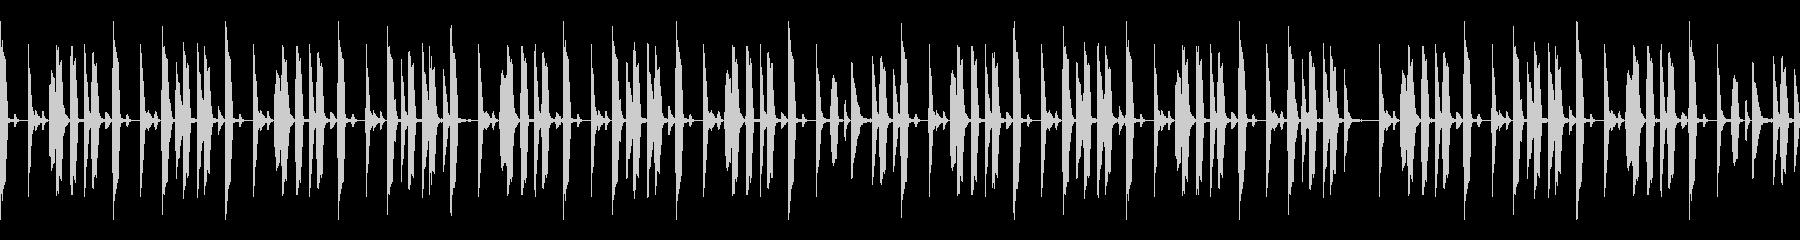 BPM100 ドラムループの未再生の波形